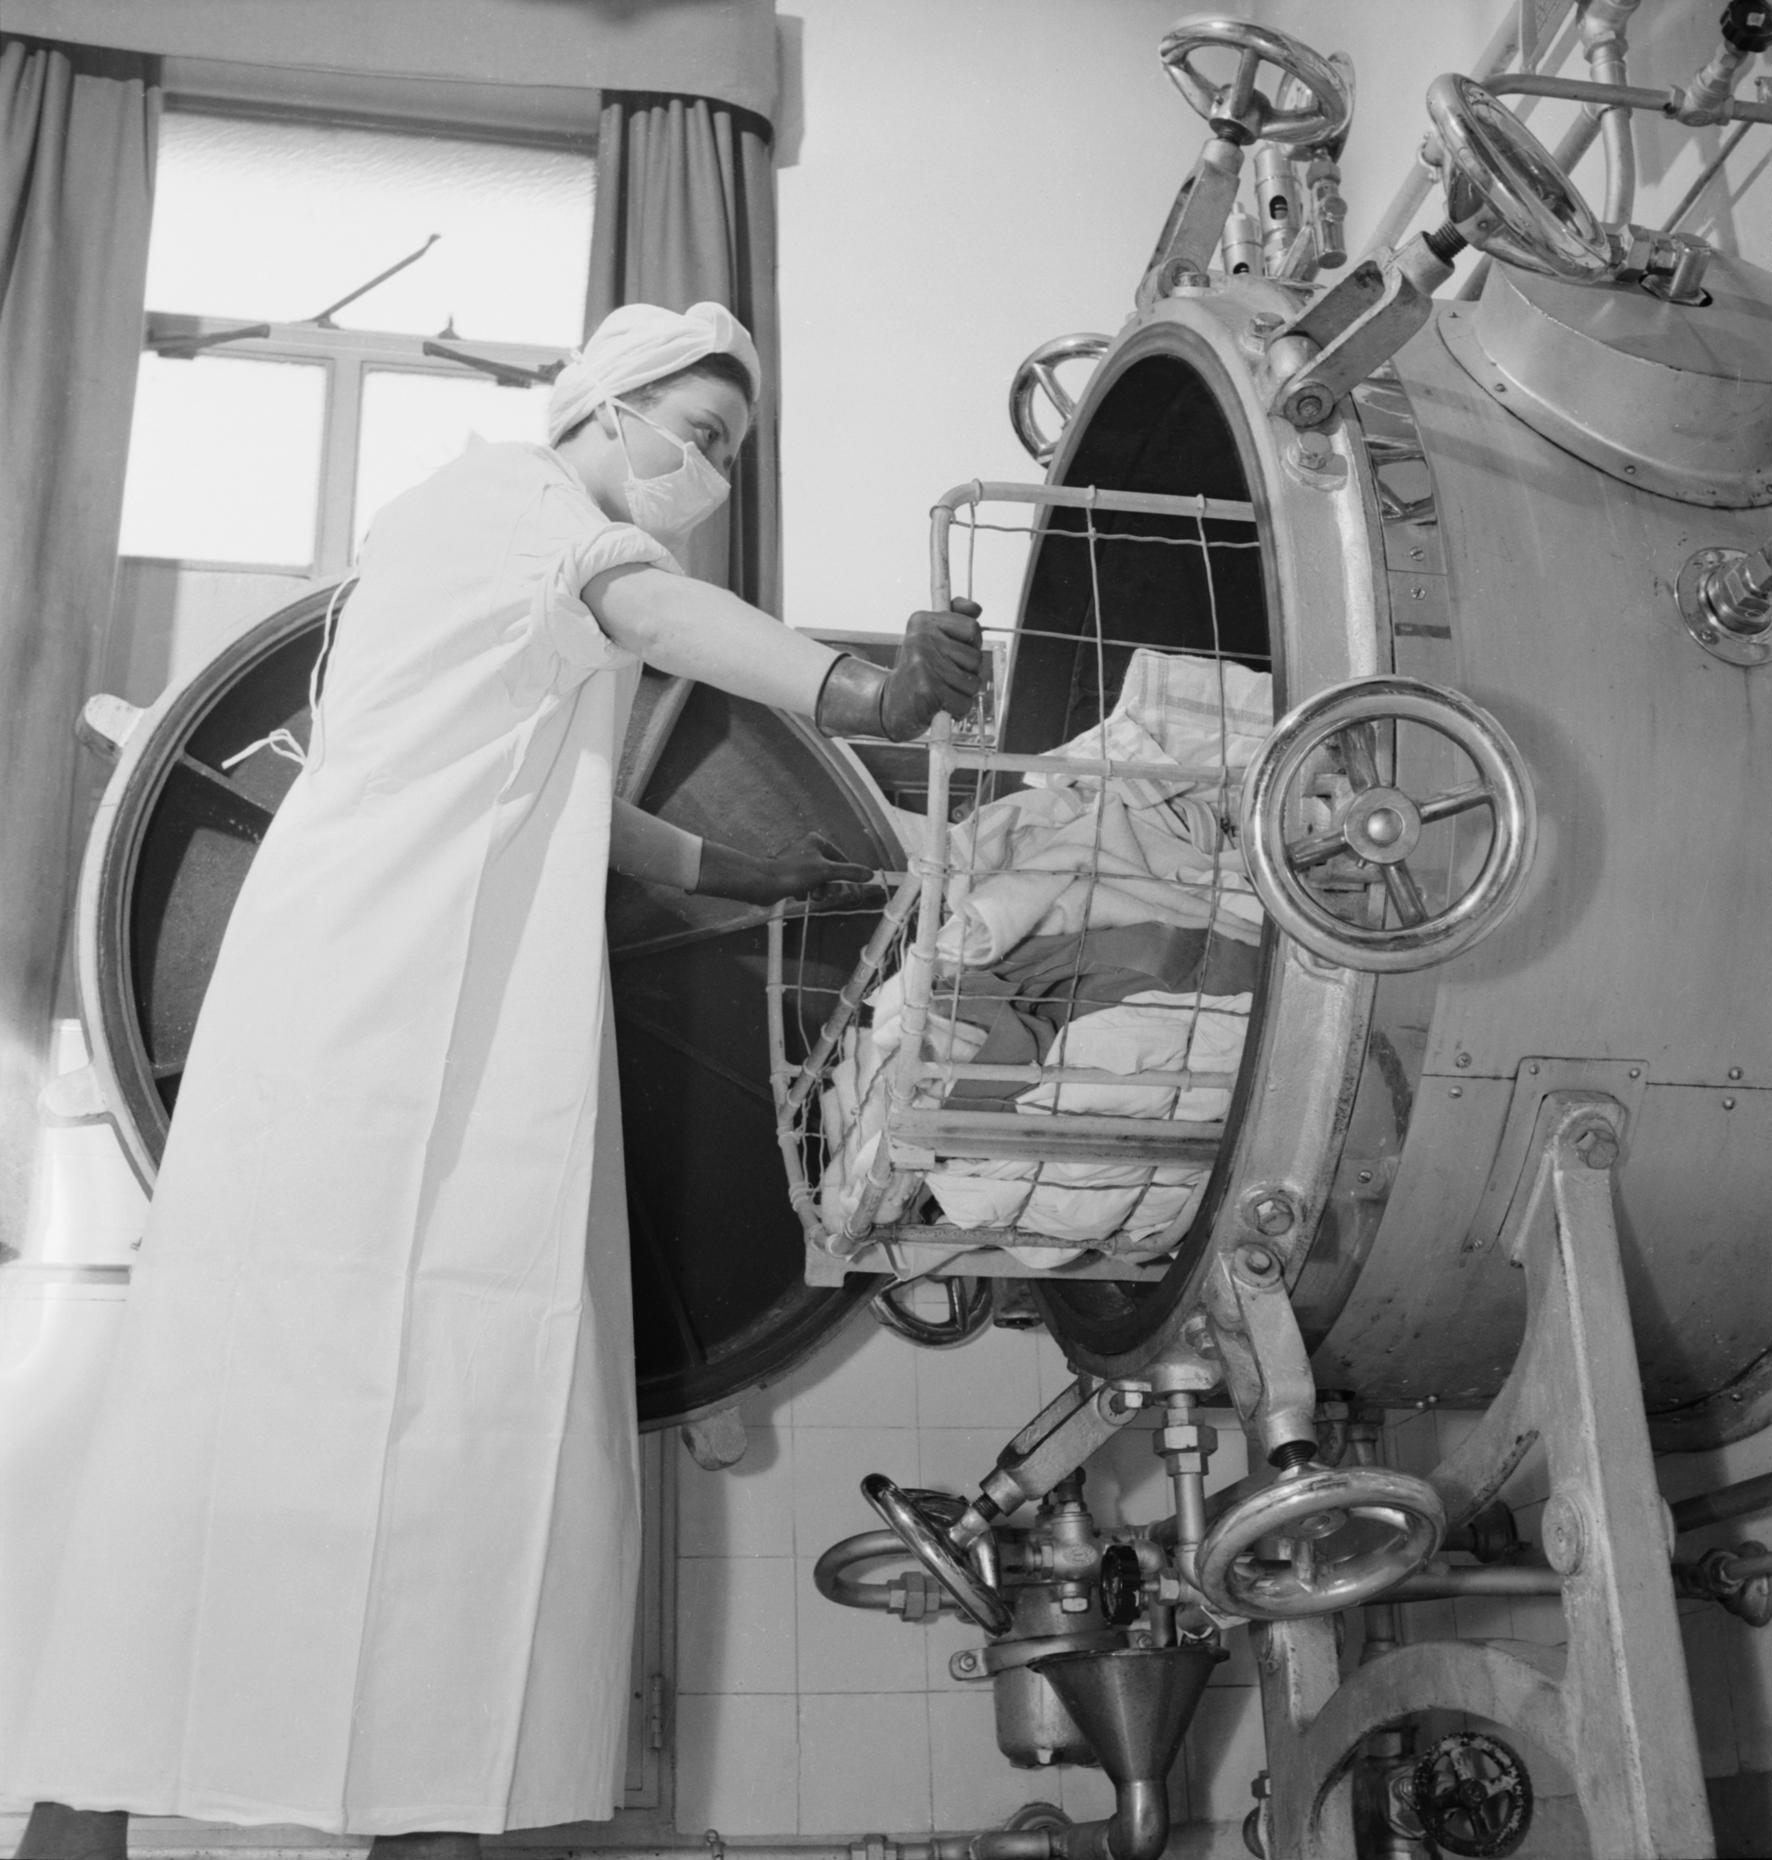 File:Student Nurse- Life at St Helier Hospital, Carshalton